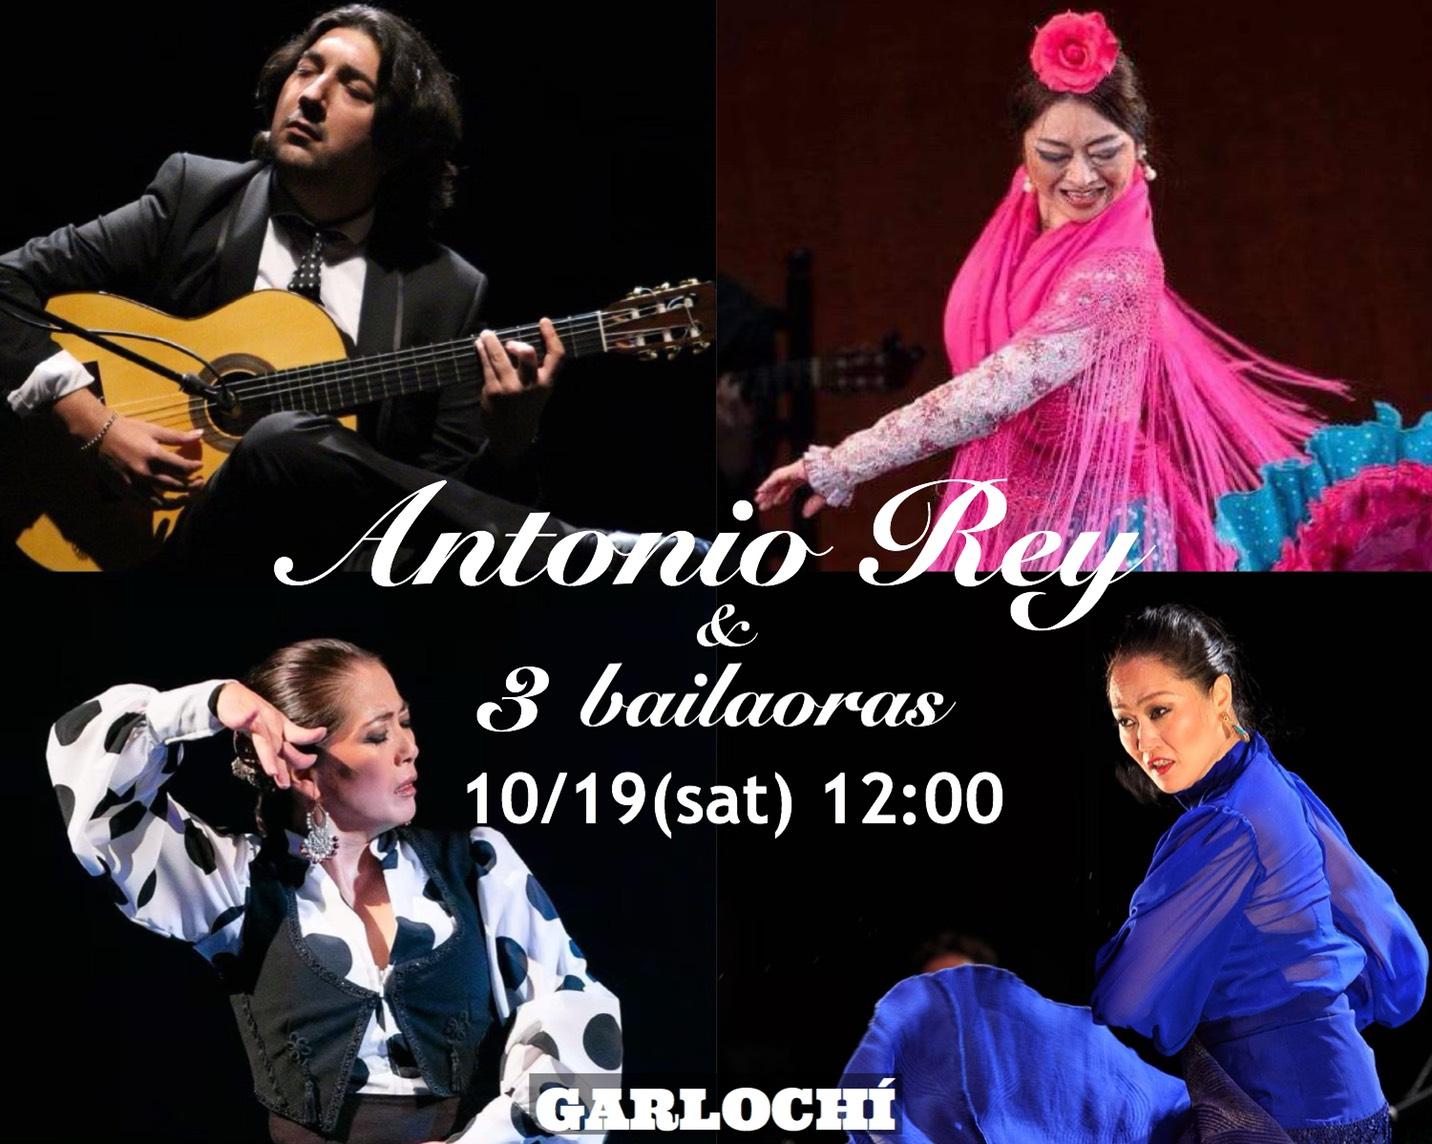 【10/19】Antonio Rey & 3Bailaoras 中田佳代子×福山奈穂美×渡部純子 Special Live!!